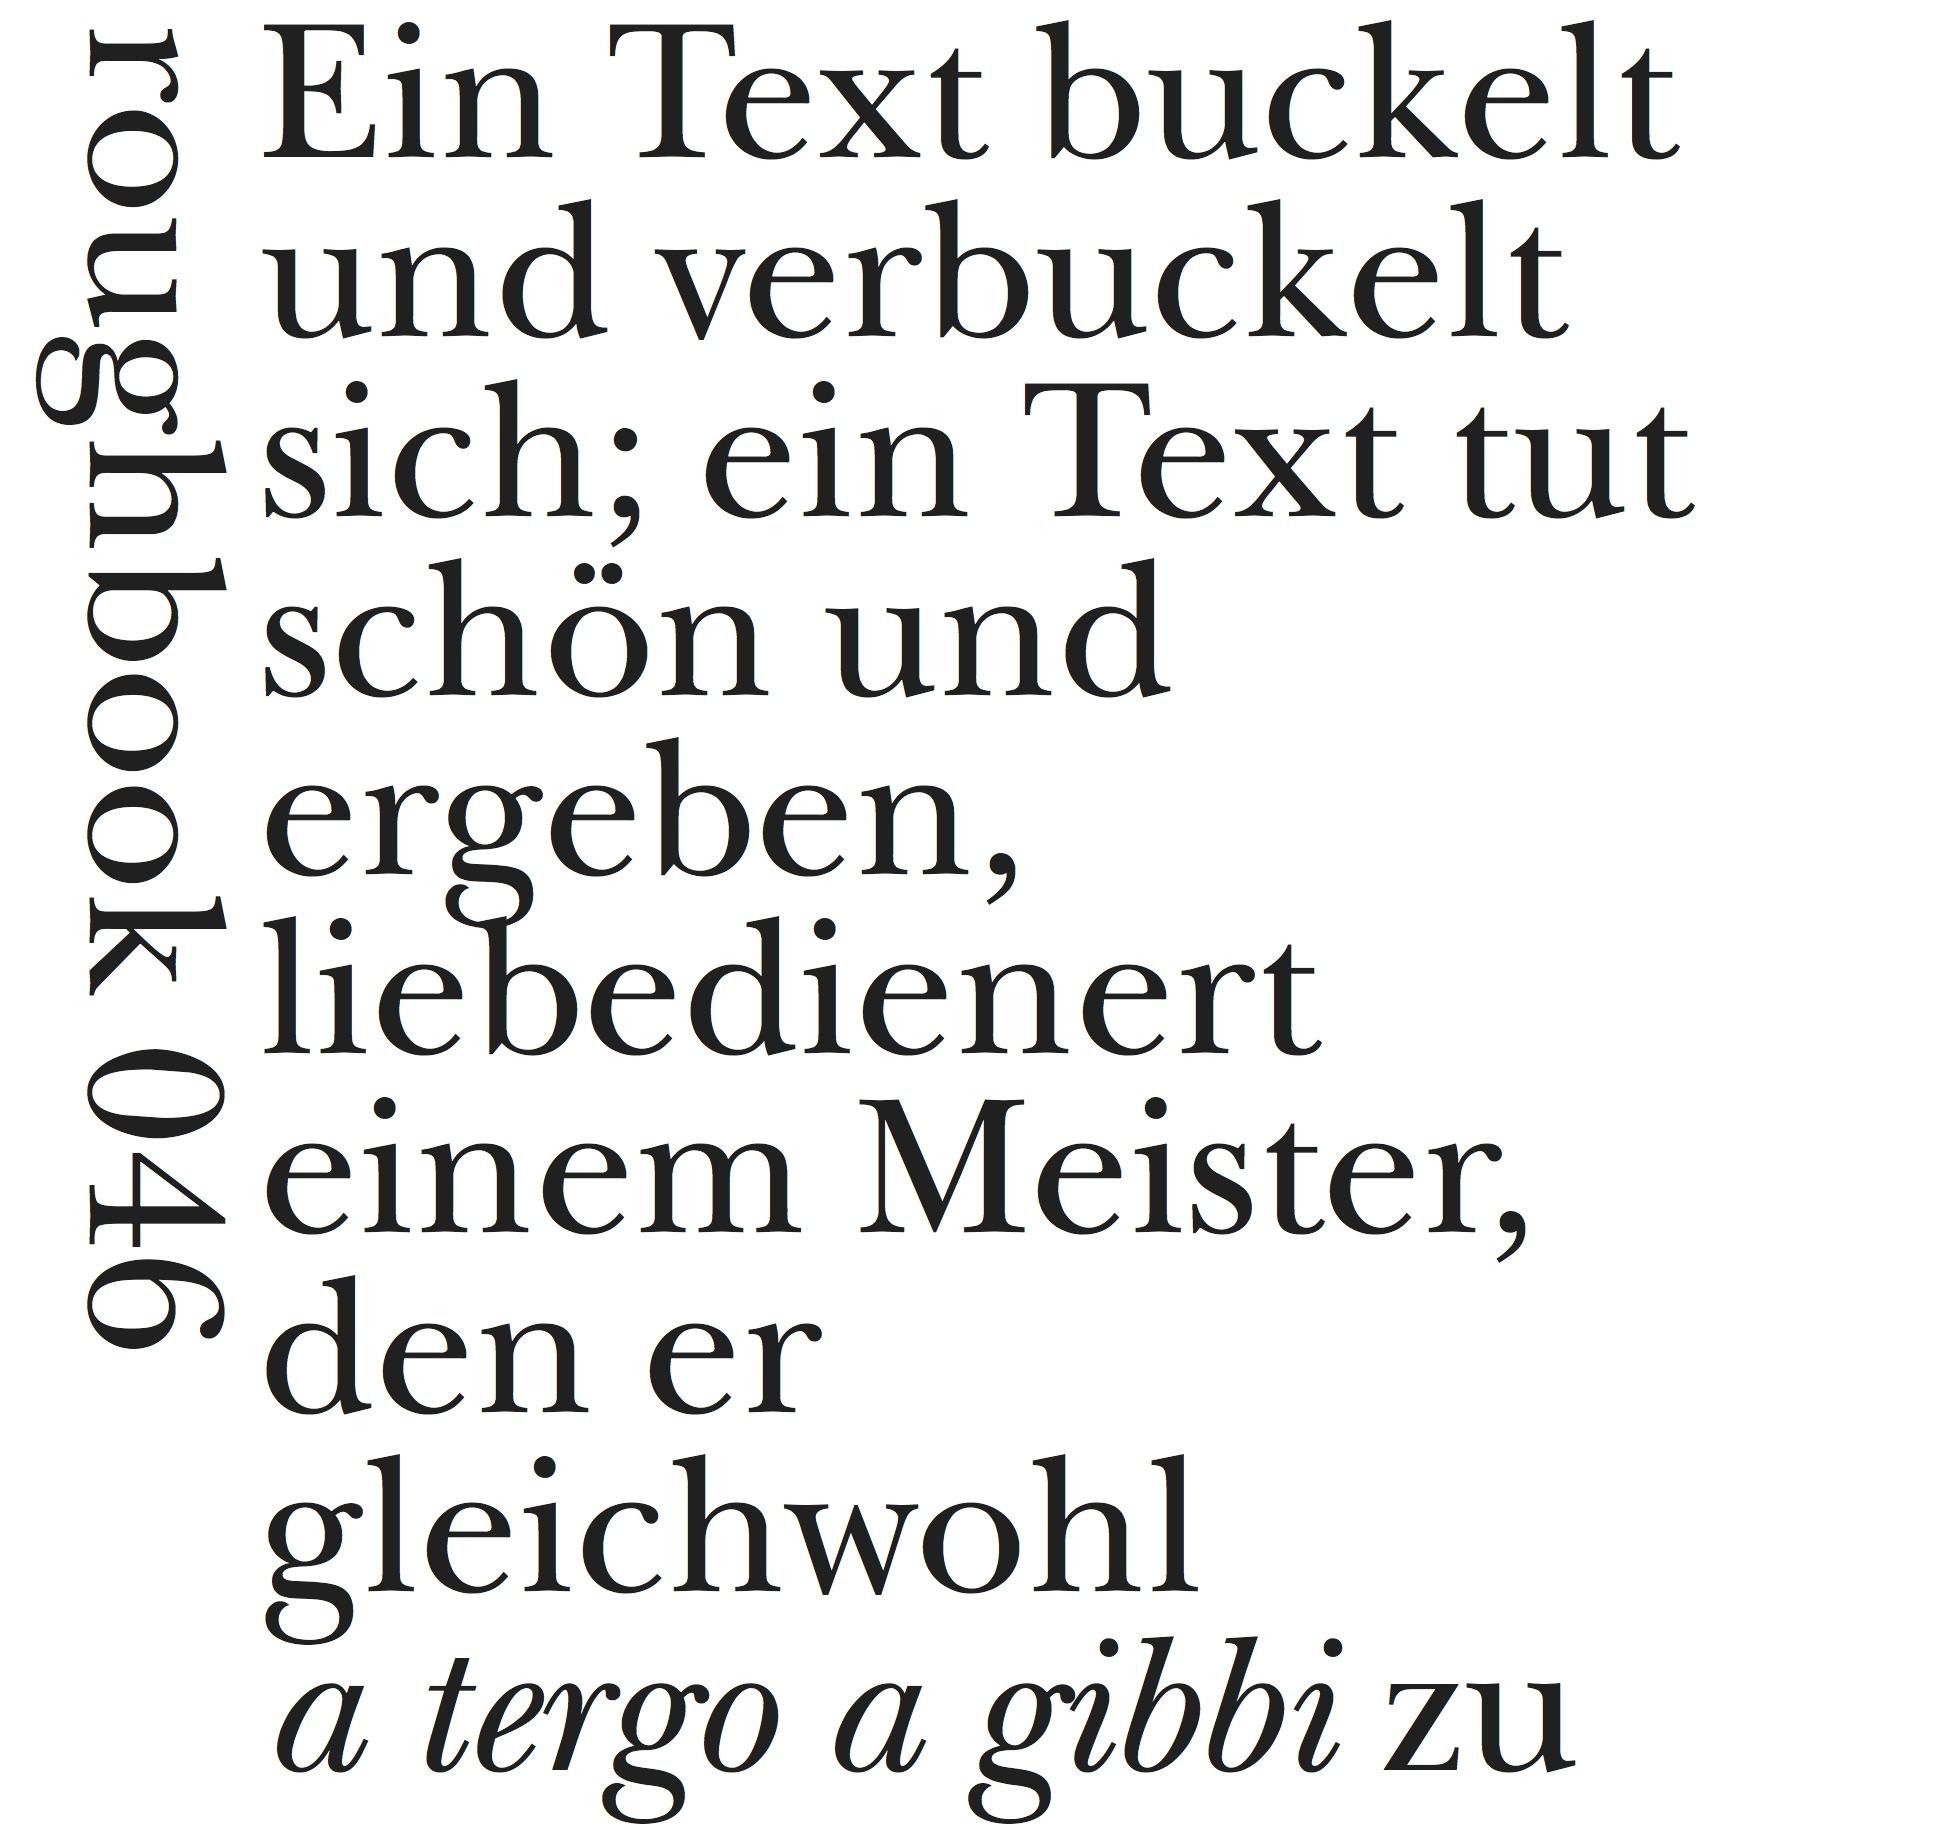 kraus-aby-ohrkranfs-hunch-poem